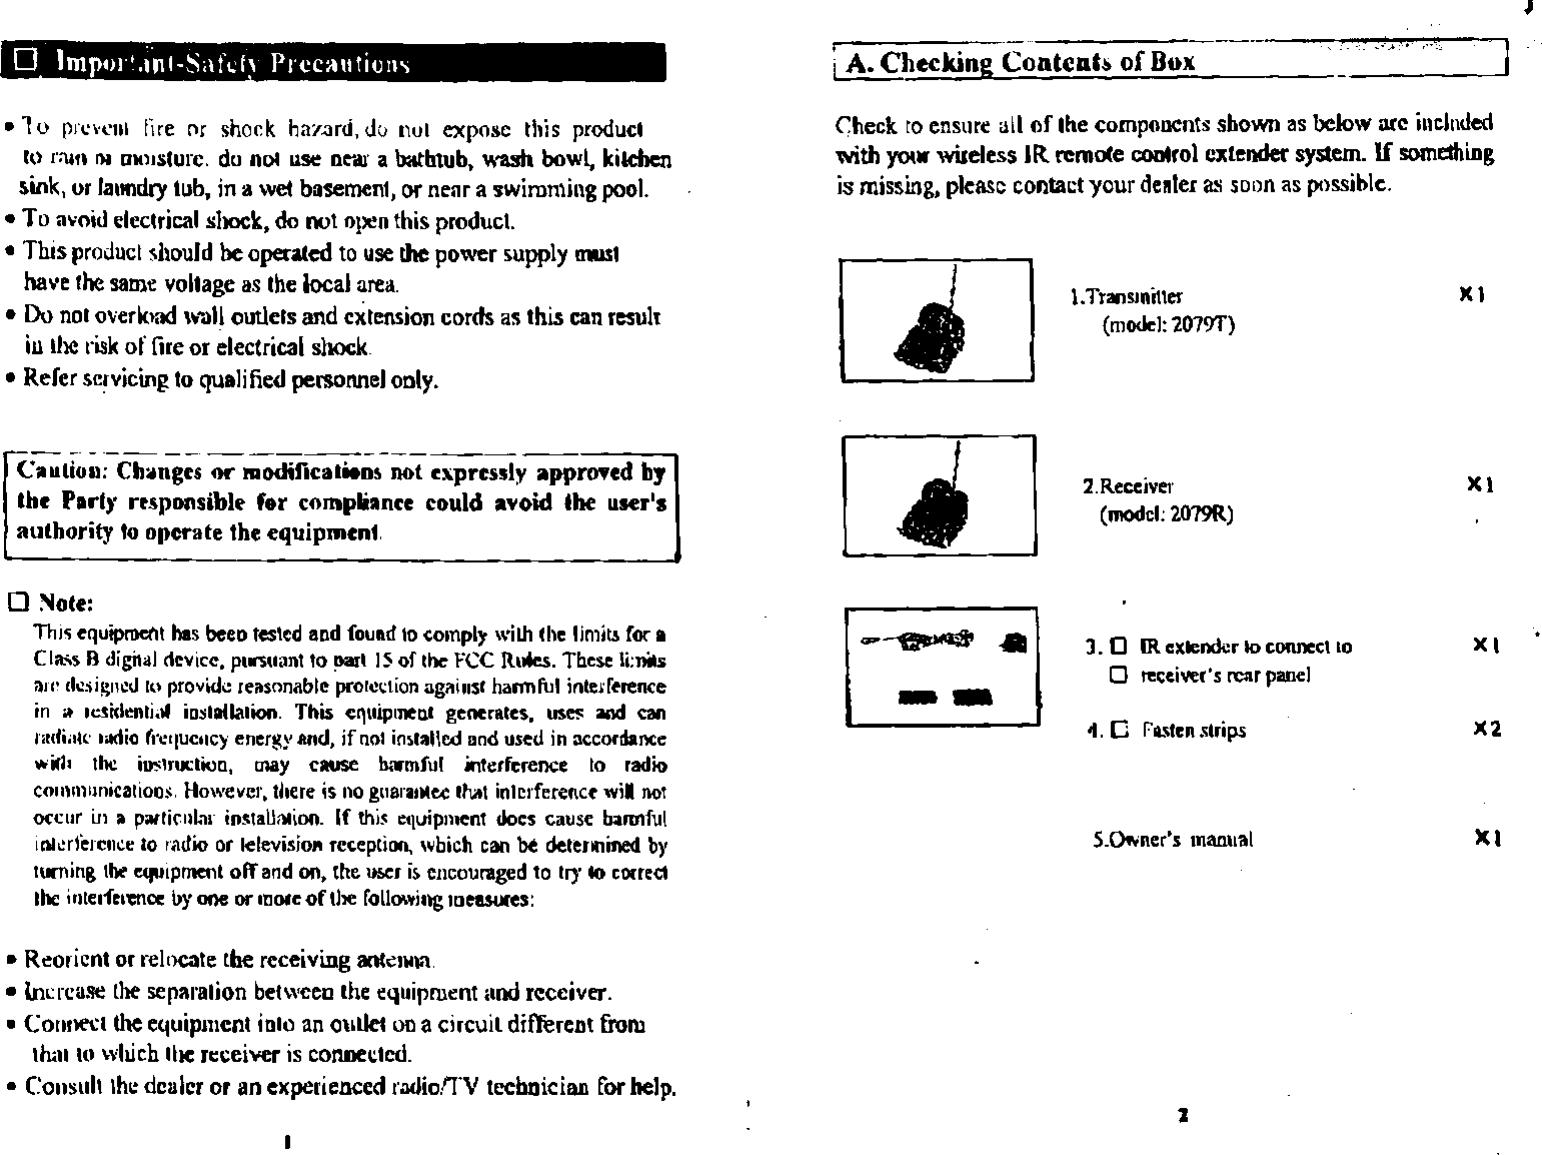 Jesmay Electronics Co Jm2079t Ir Remote Control Extender User Manual Checking